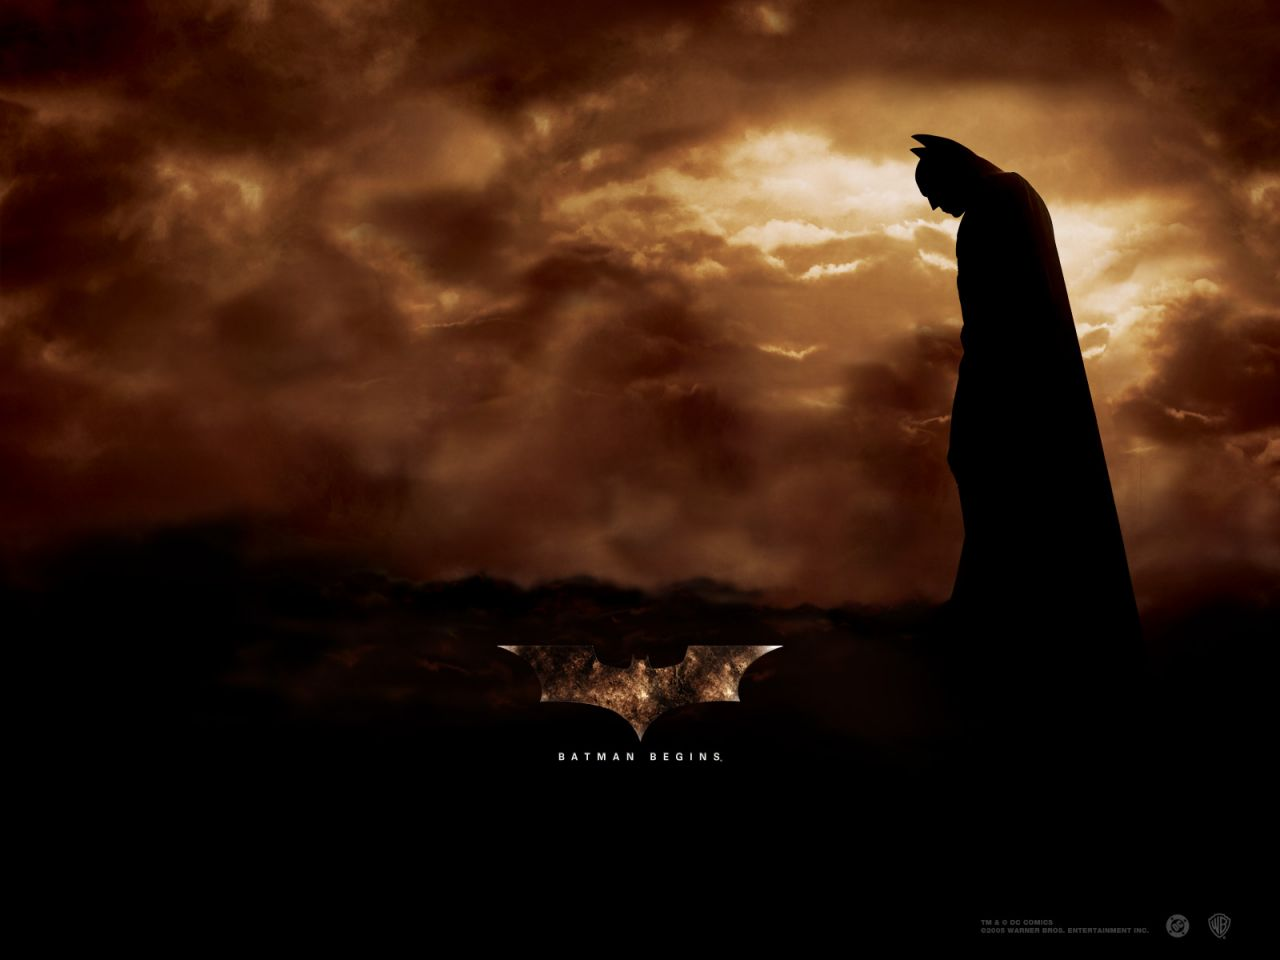 Batman Clouds Background Poster Wallpaper 1280x960